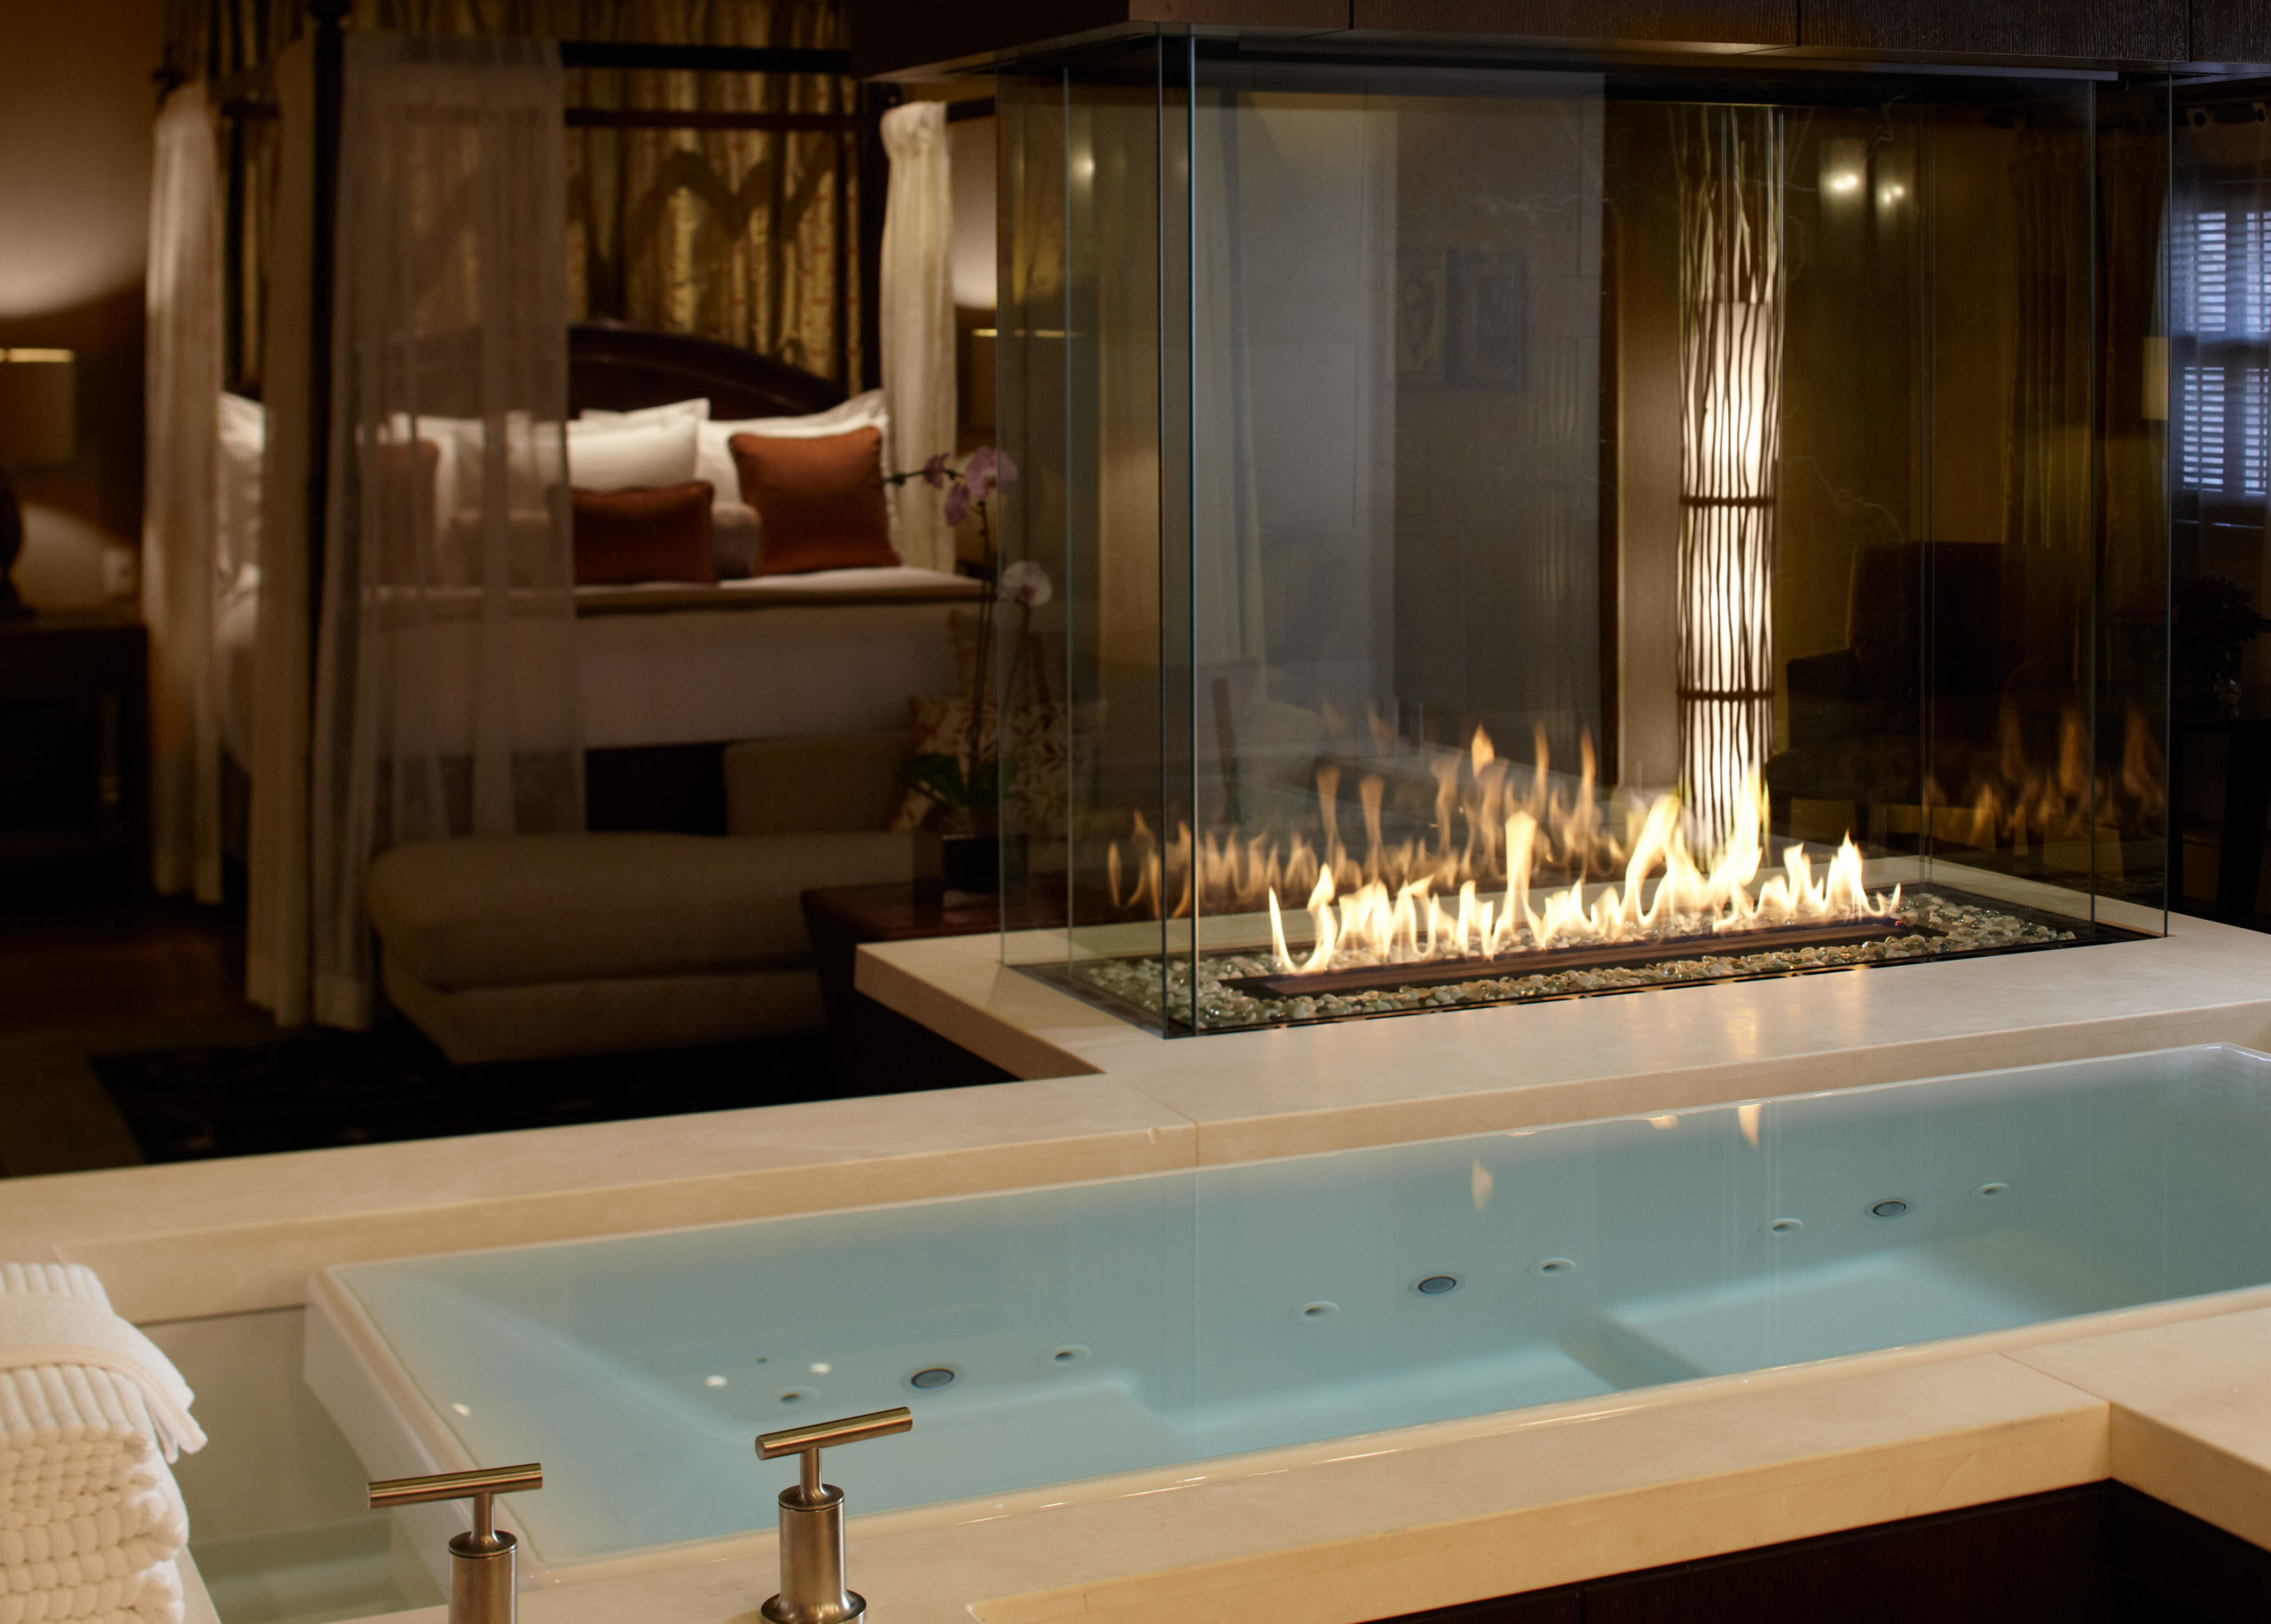 Bathroom at the American Club Resort